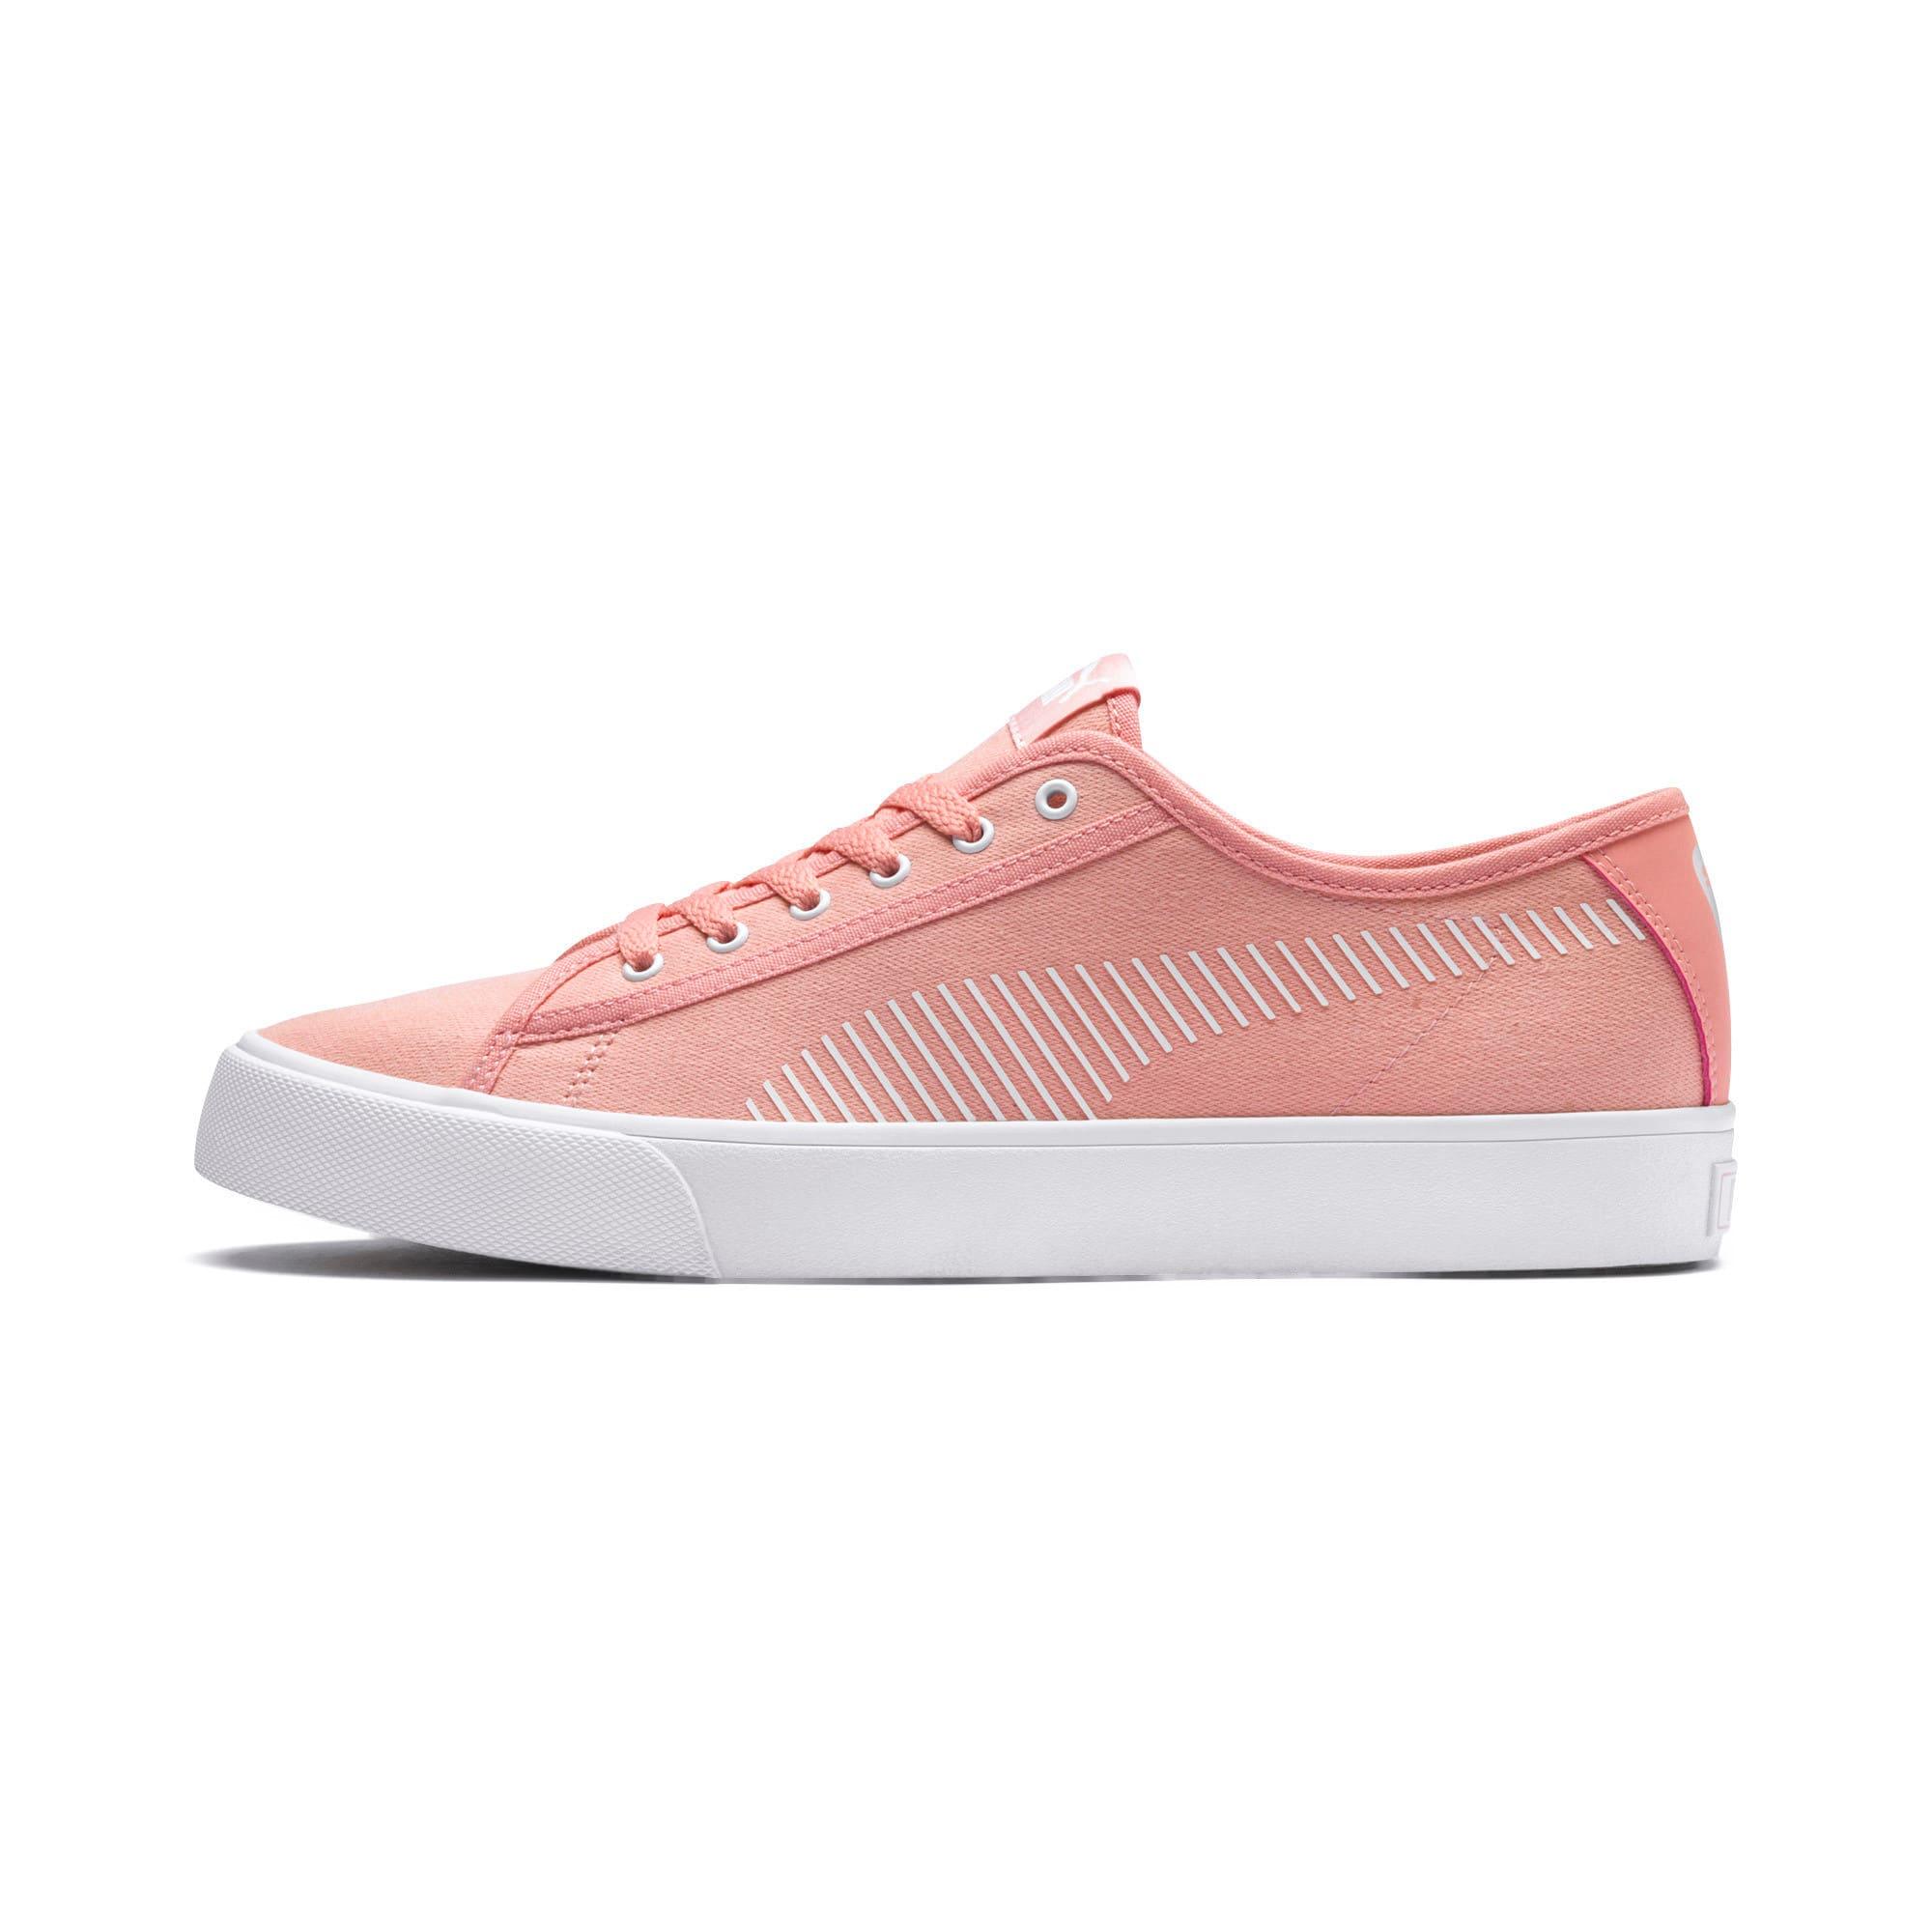 Thumbnail 1 of Bari Sneakers, Peach Bud-Puma White, medium